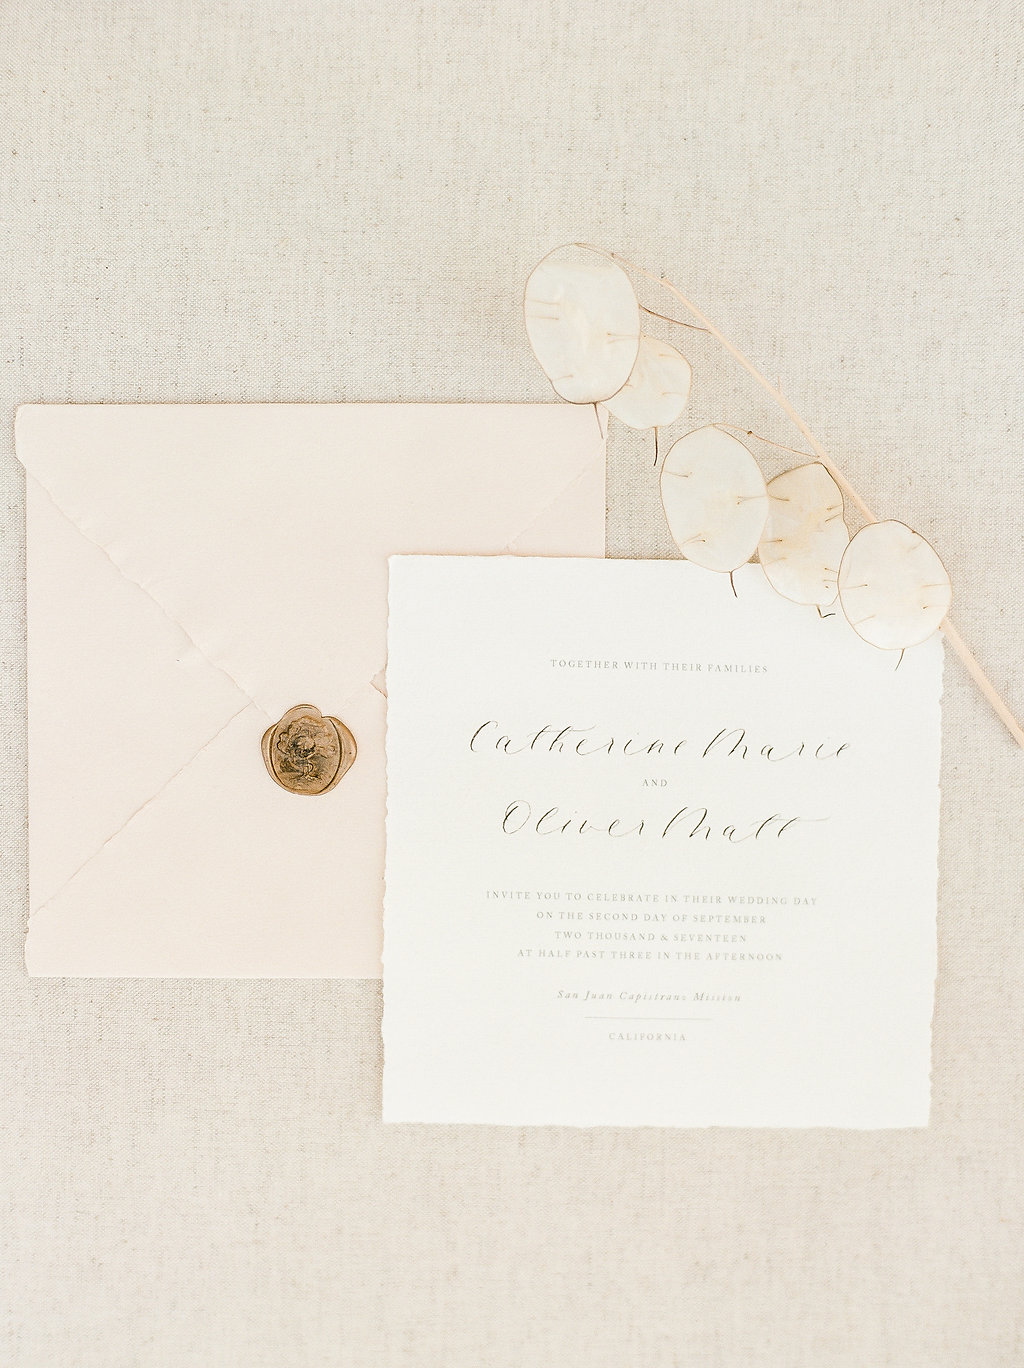 Spanish Mission Style Wedding Ideas Bridal Accessories Summer Flowers Finding Flora Wedding Sparrow Fine Art Flourish Calligraphy Invites Stationery San Juan Capistrano Lunaria